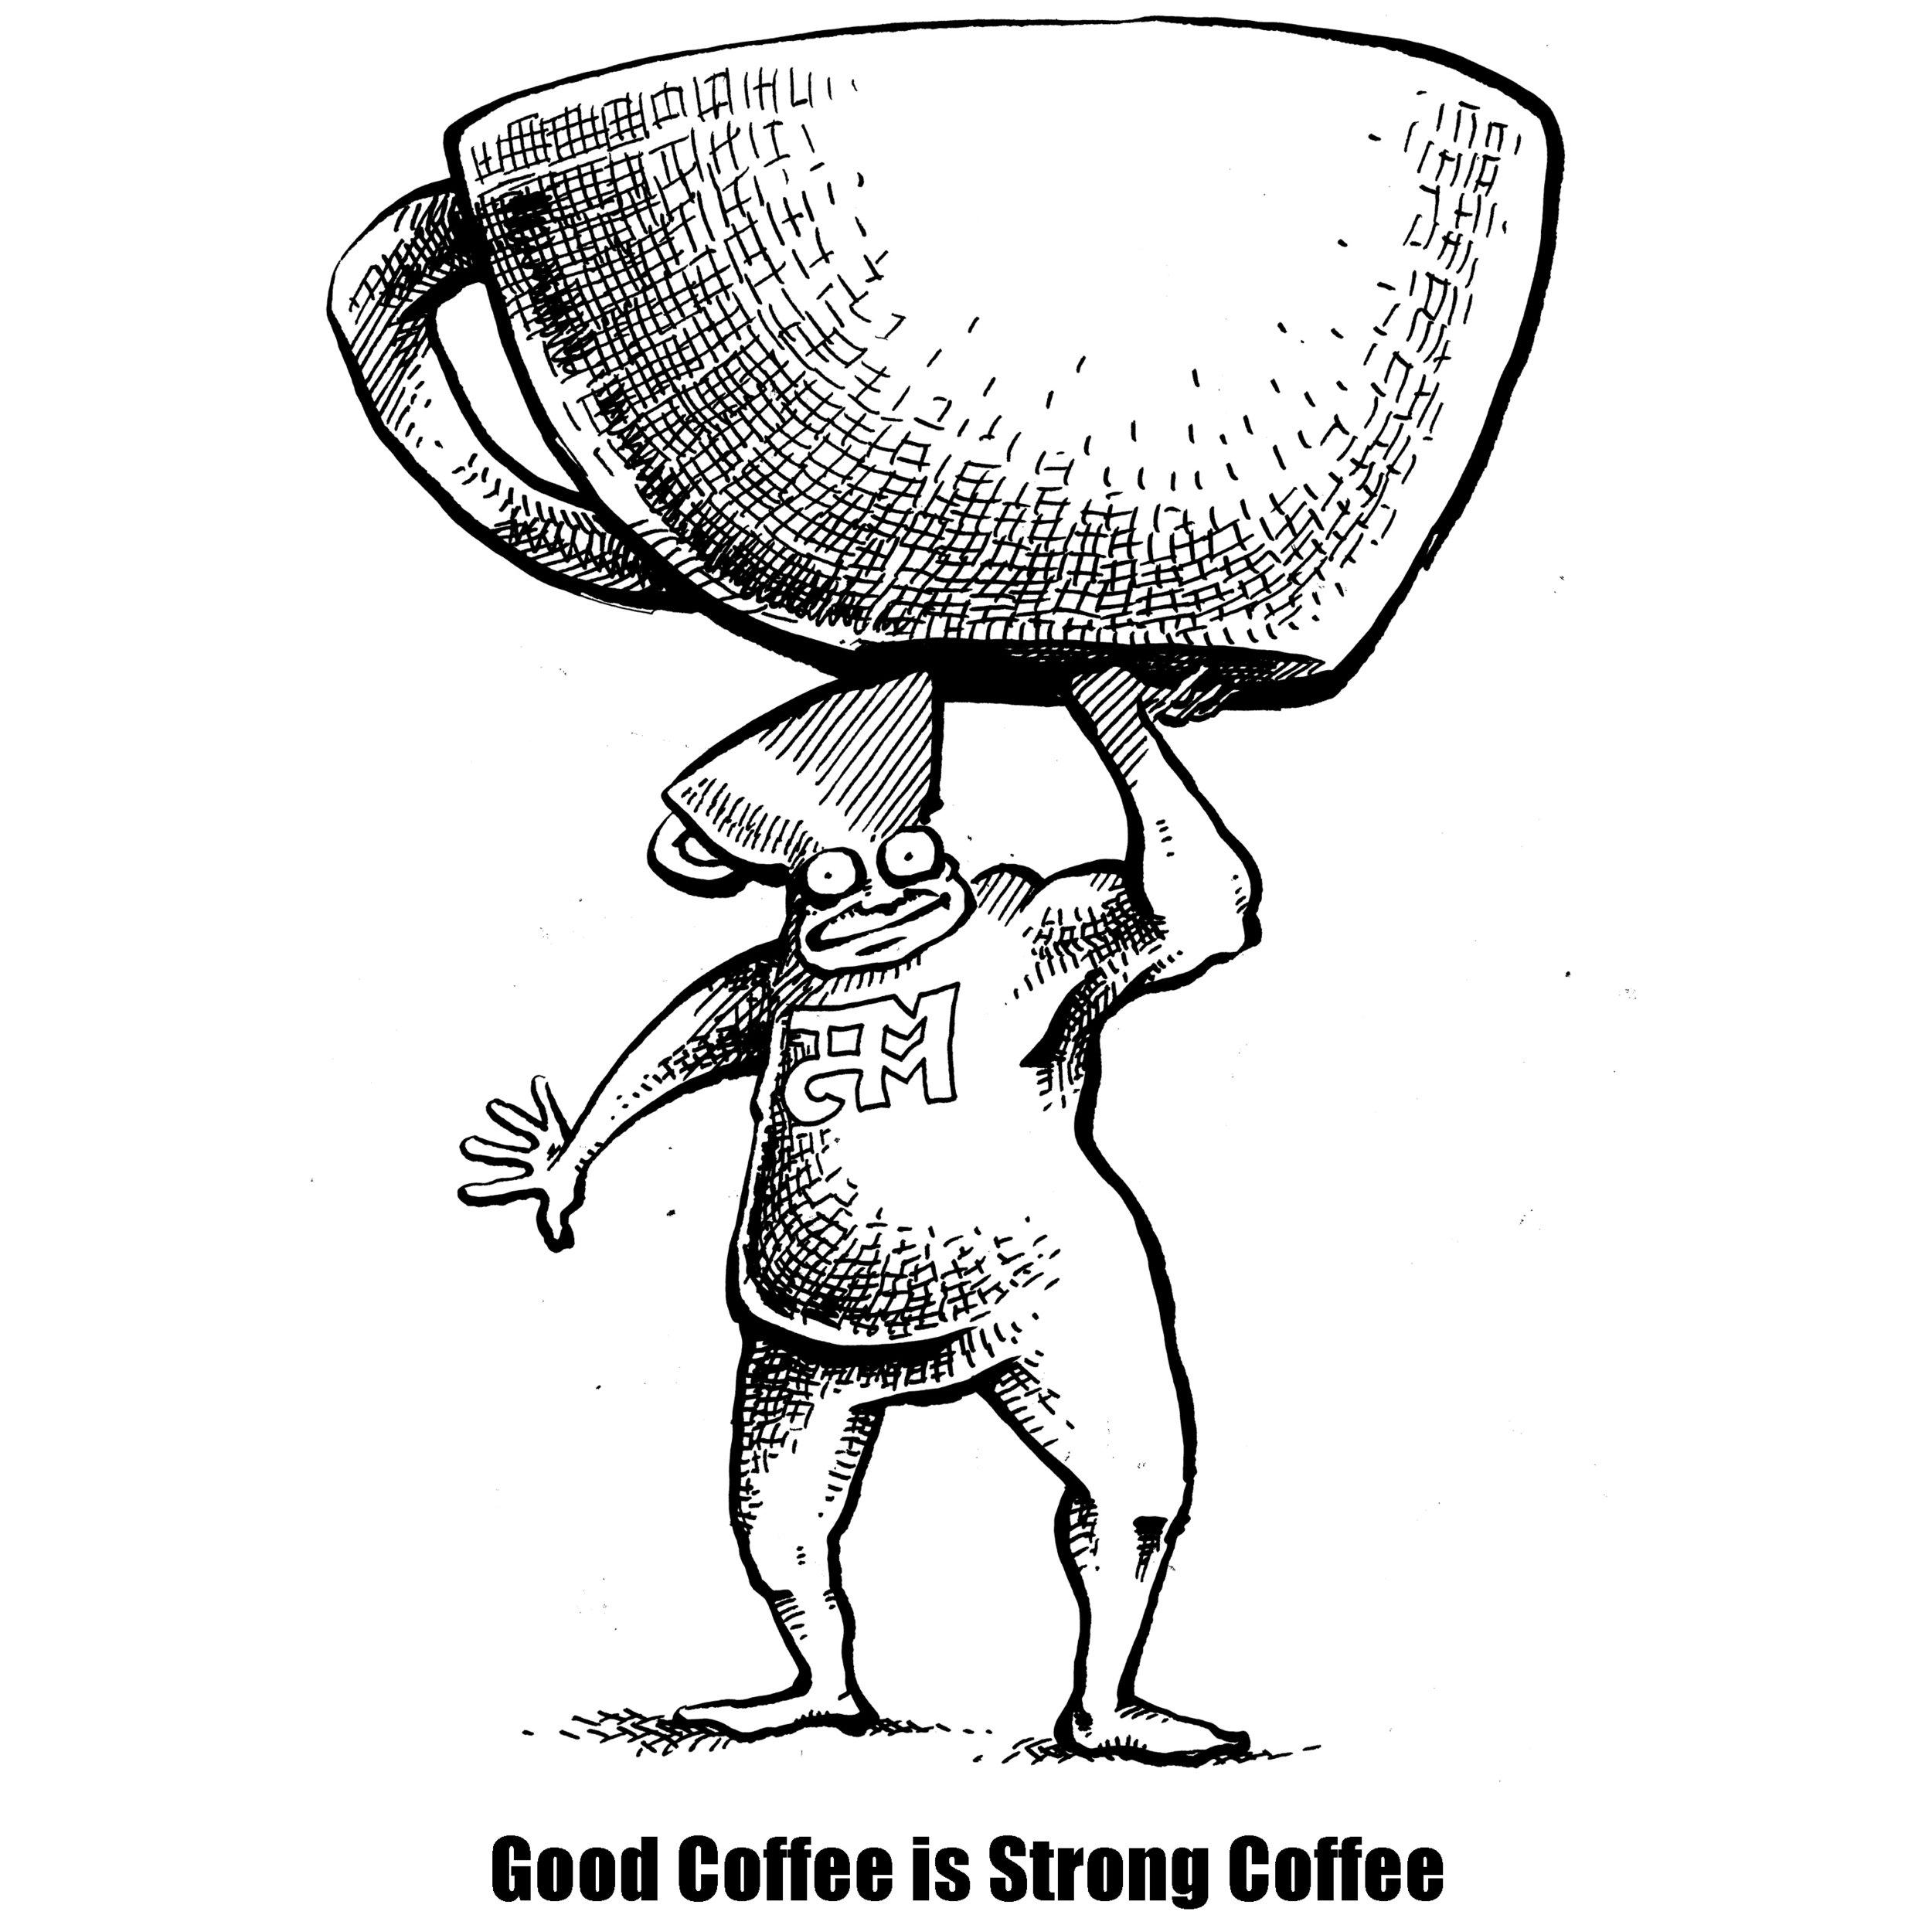 Good Coffee is Strong Coffee